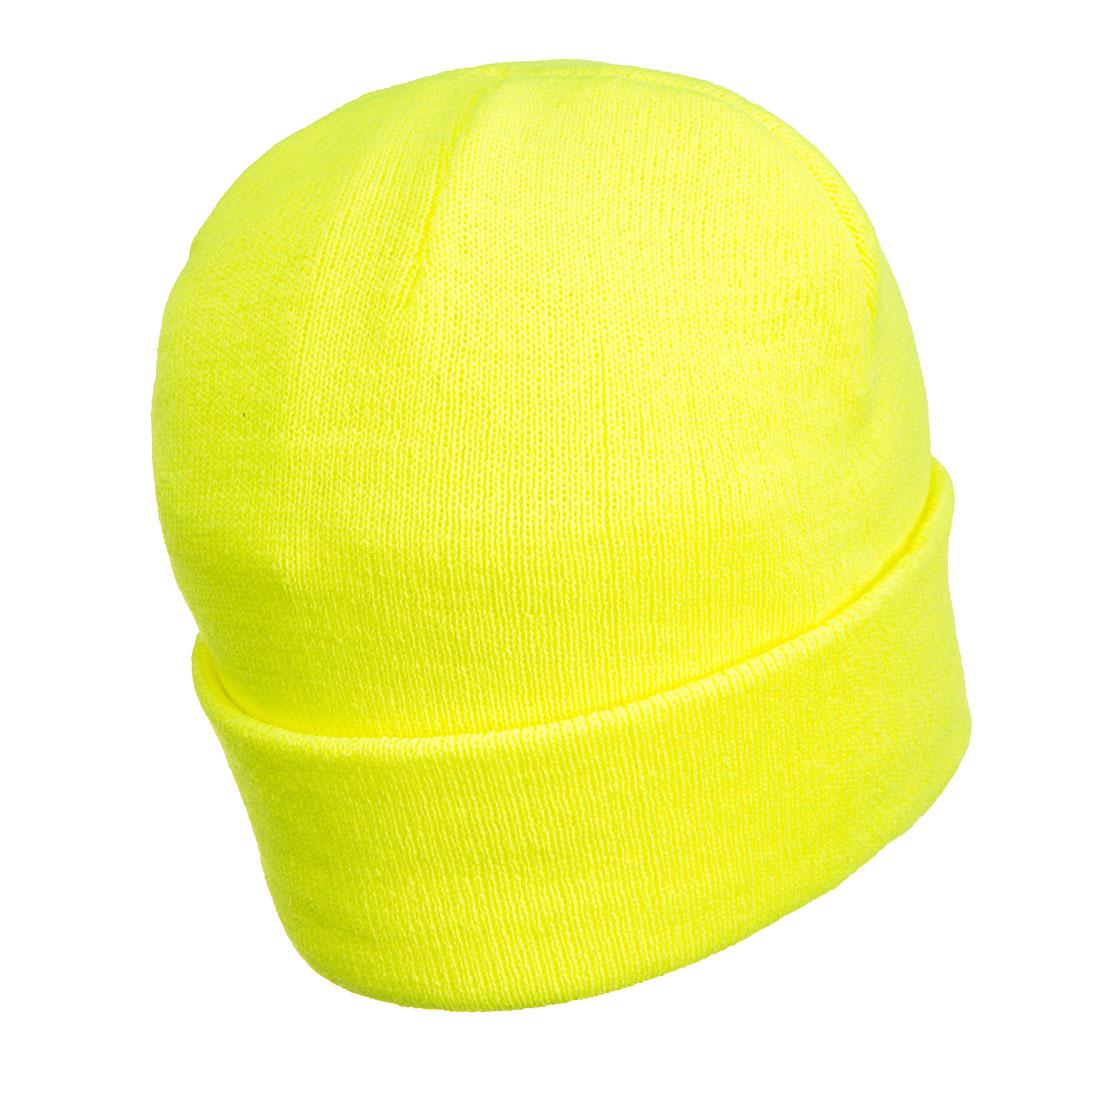 Portwest Beanie LED Head Light Torch Hat USB Rechargable Knitted Unisex BO29